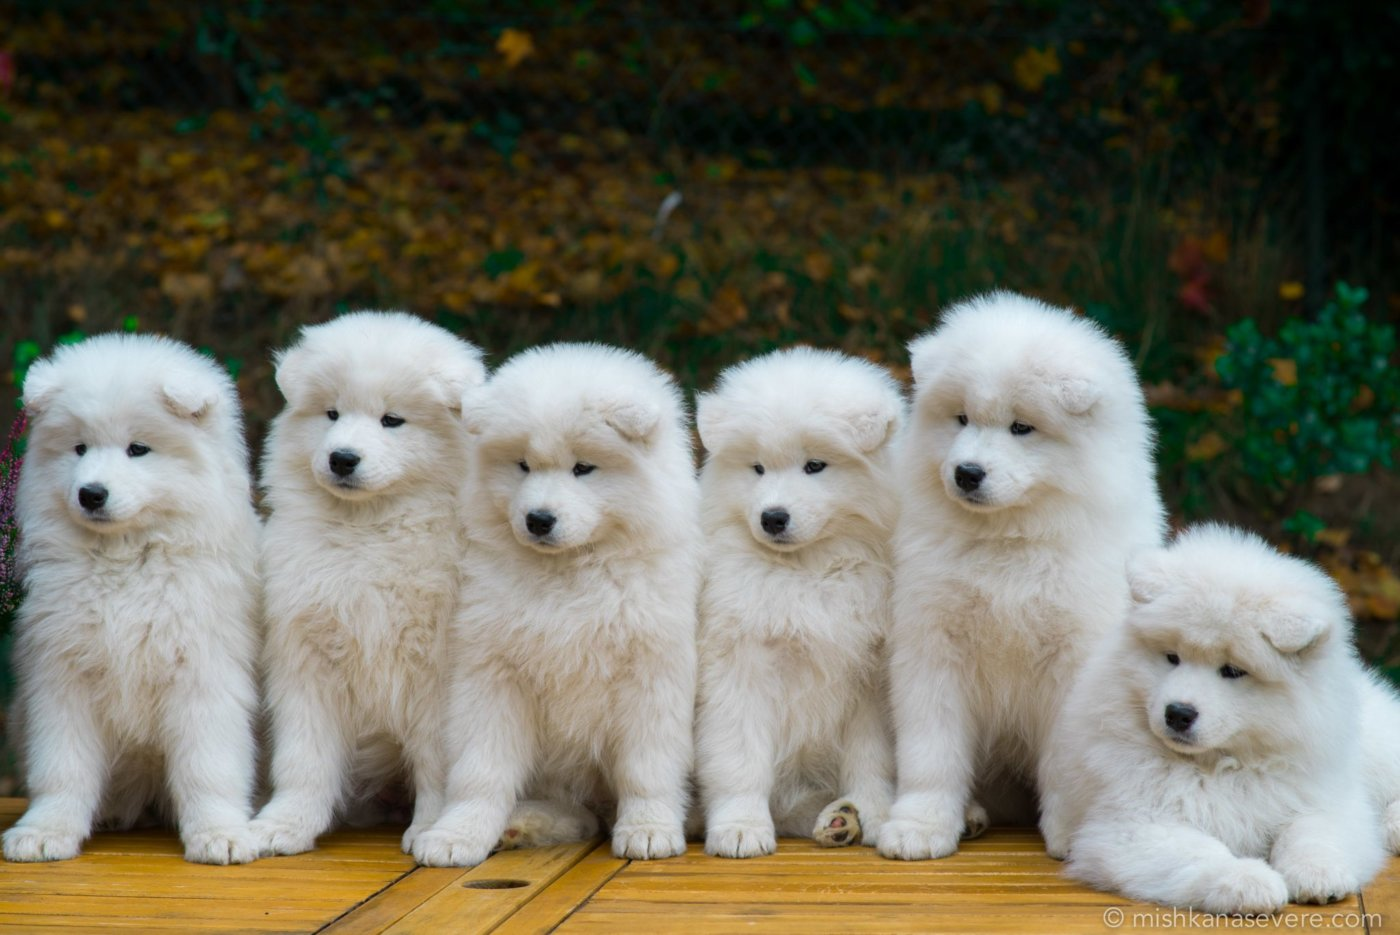 Samoyeds kennel Mishka na Severe - Samoyed puppies